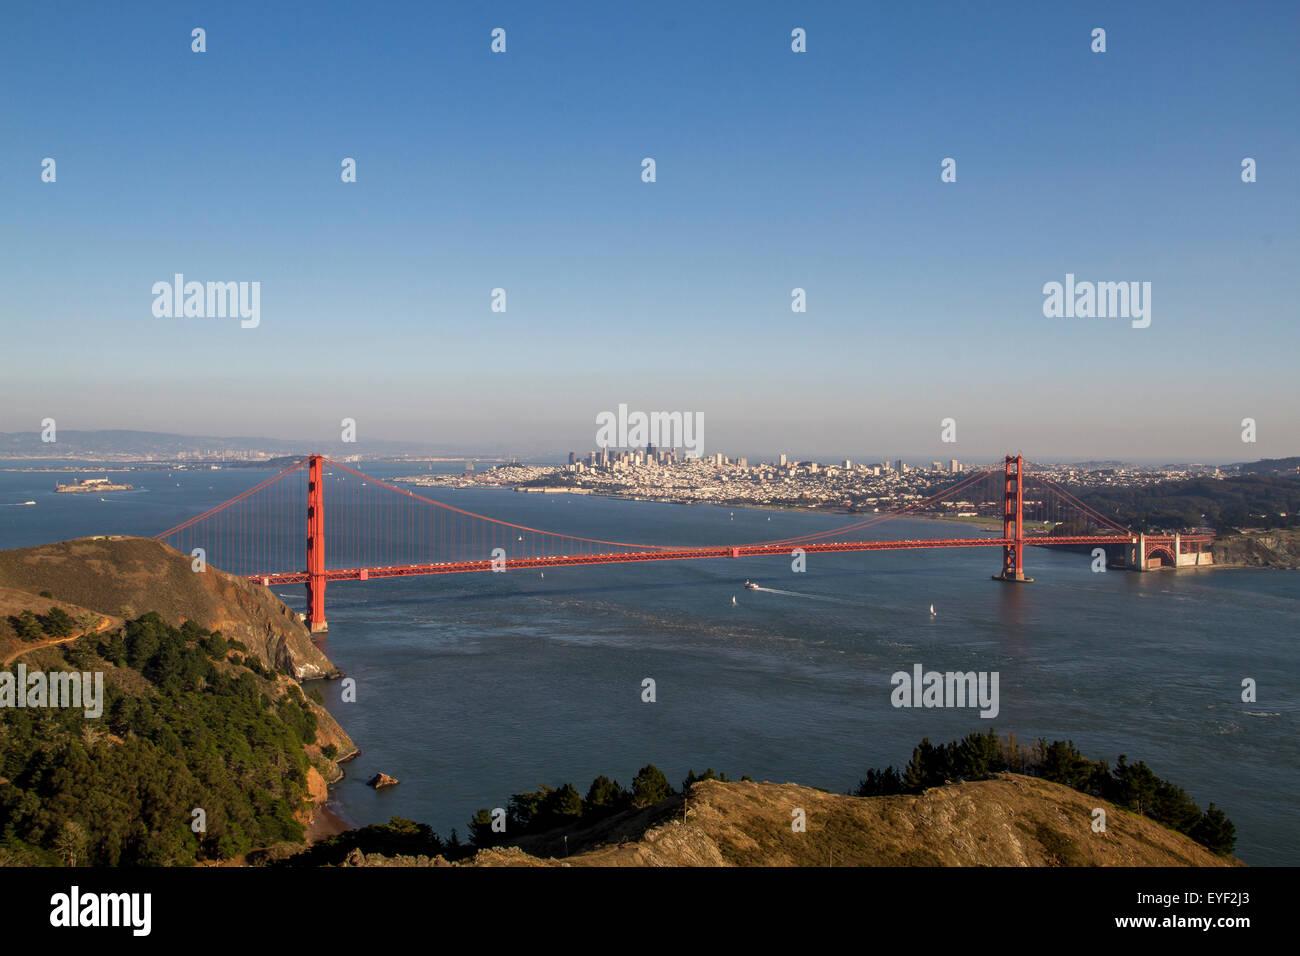 The Golden Gate suspension bridge from the Marin Headlands,San Francisco,California,USA Stock Photo